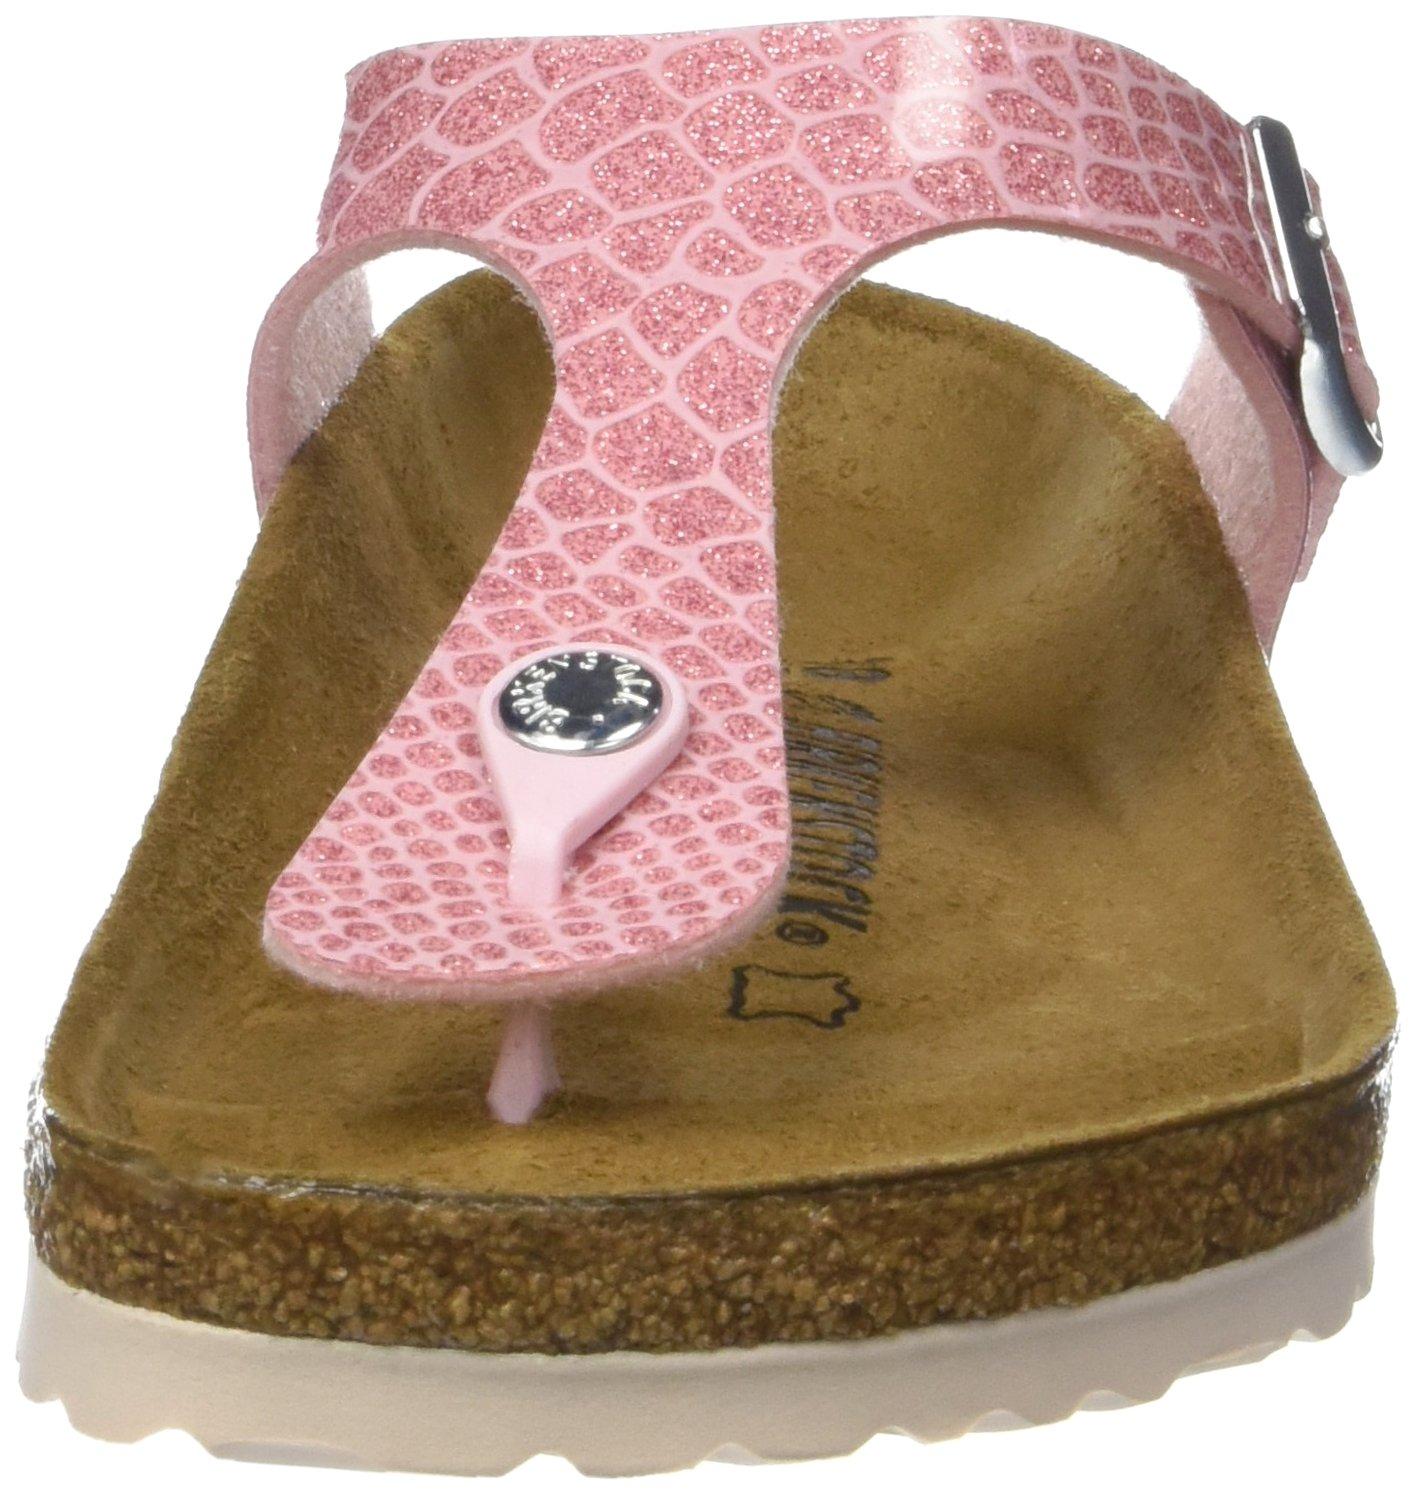 Birkenstock Gizeh Magic Snake Rose Birko-Flor Flat Sandals B0775XQHKW 7.5 M US Pink